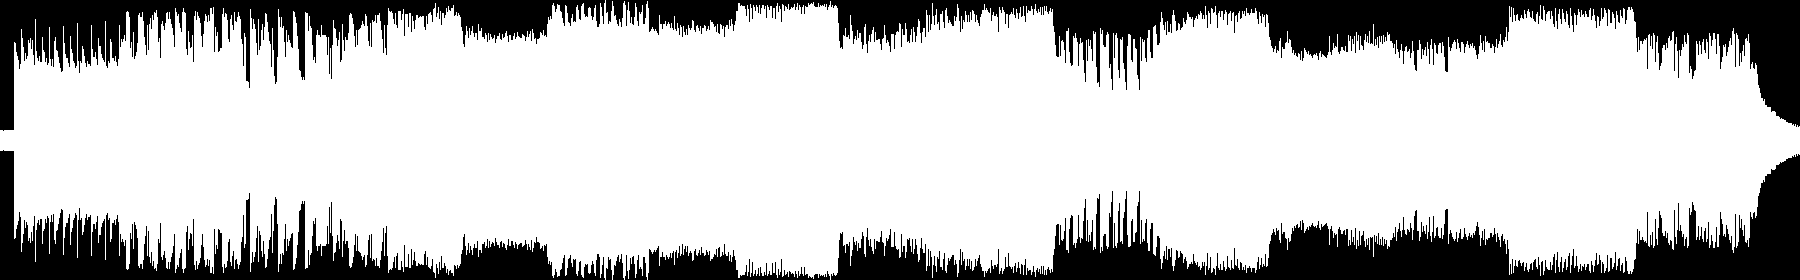 TSUBAKI audio waveform